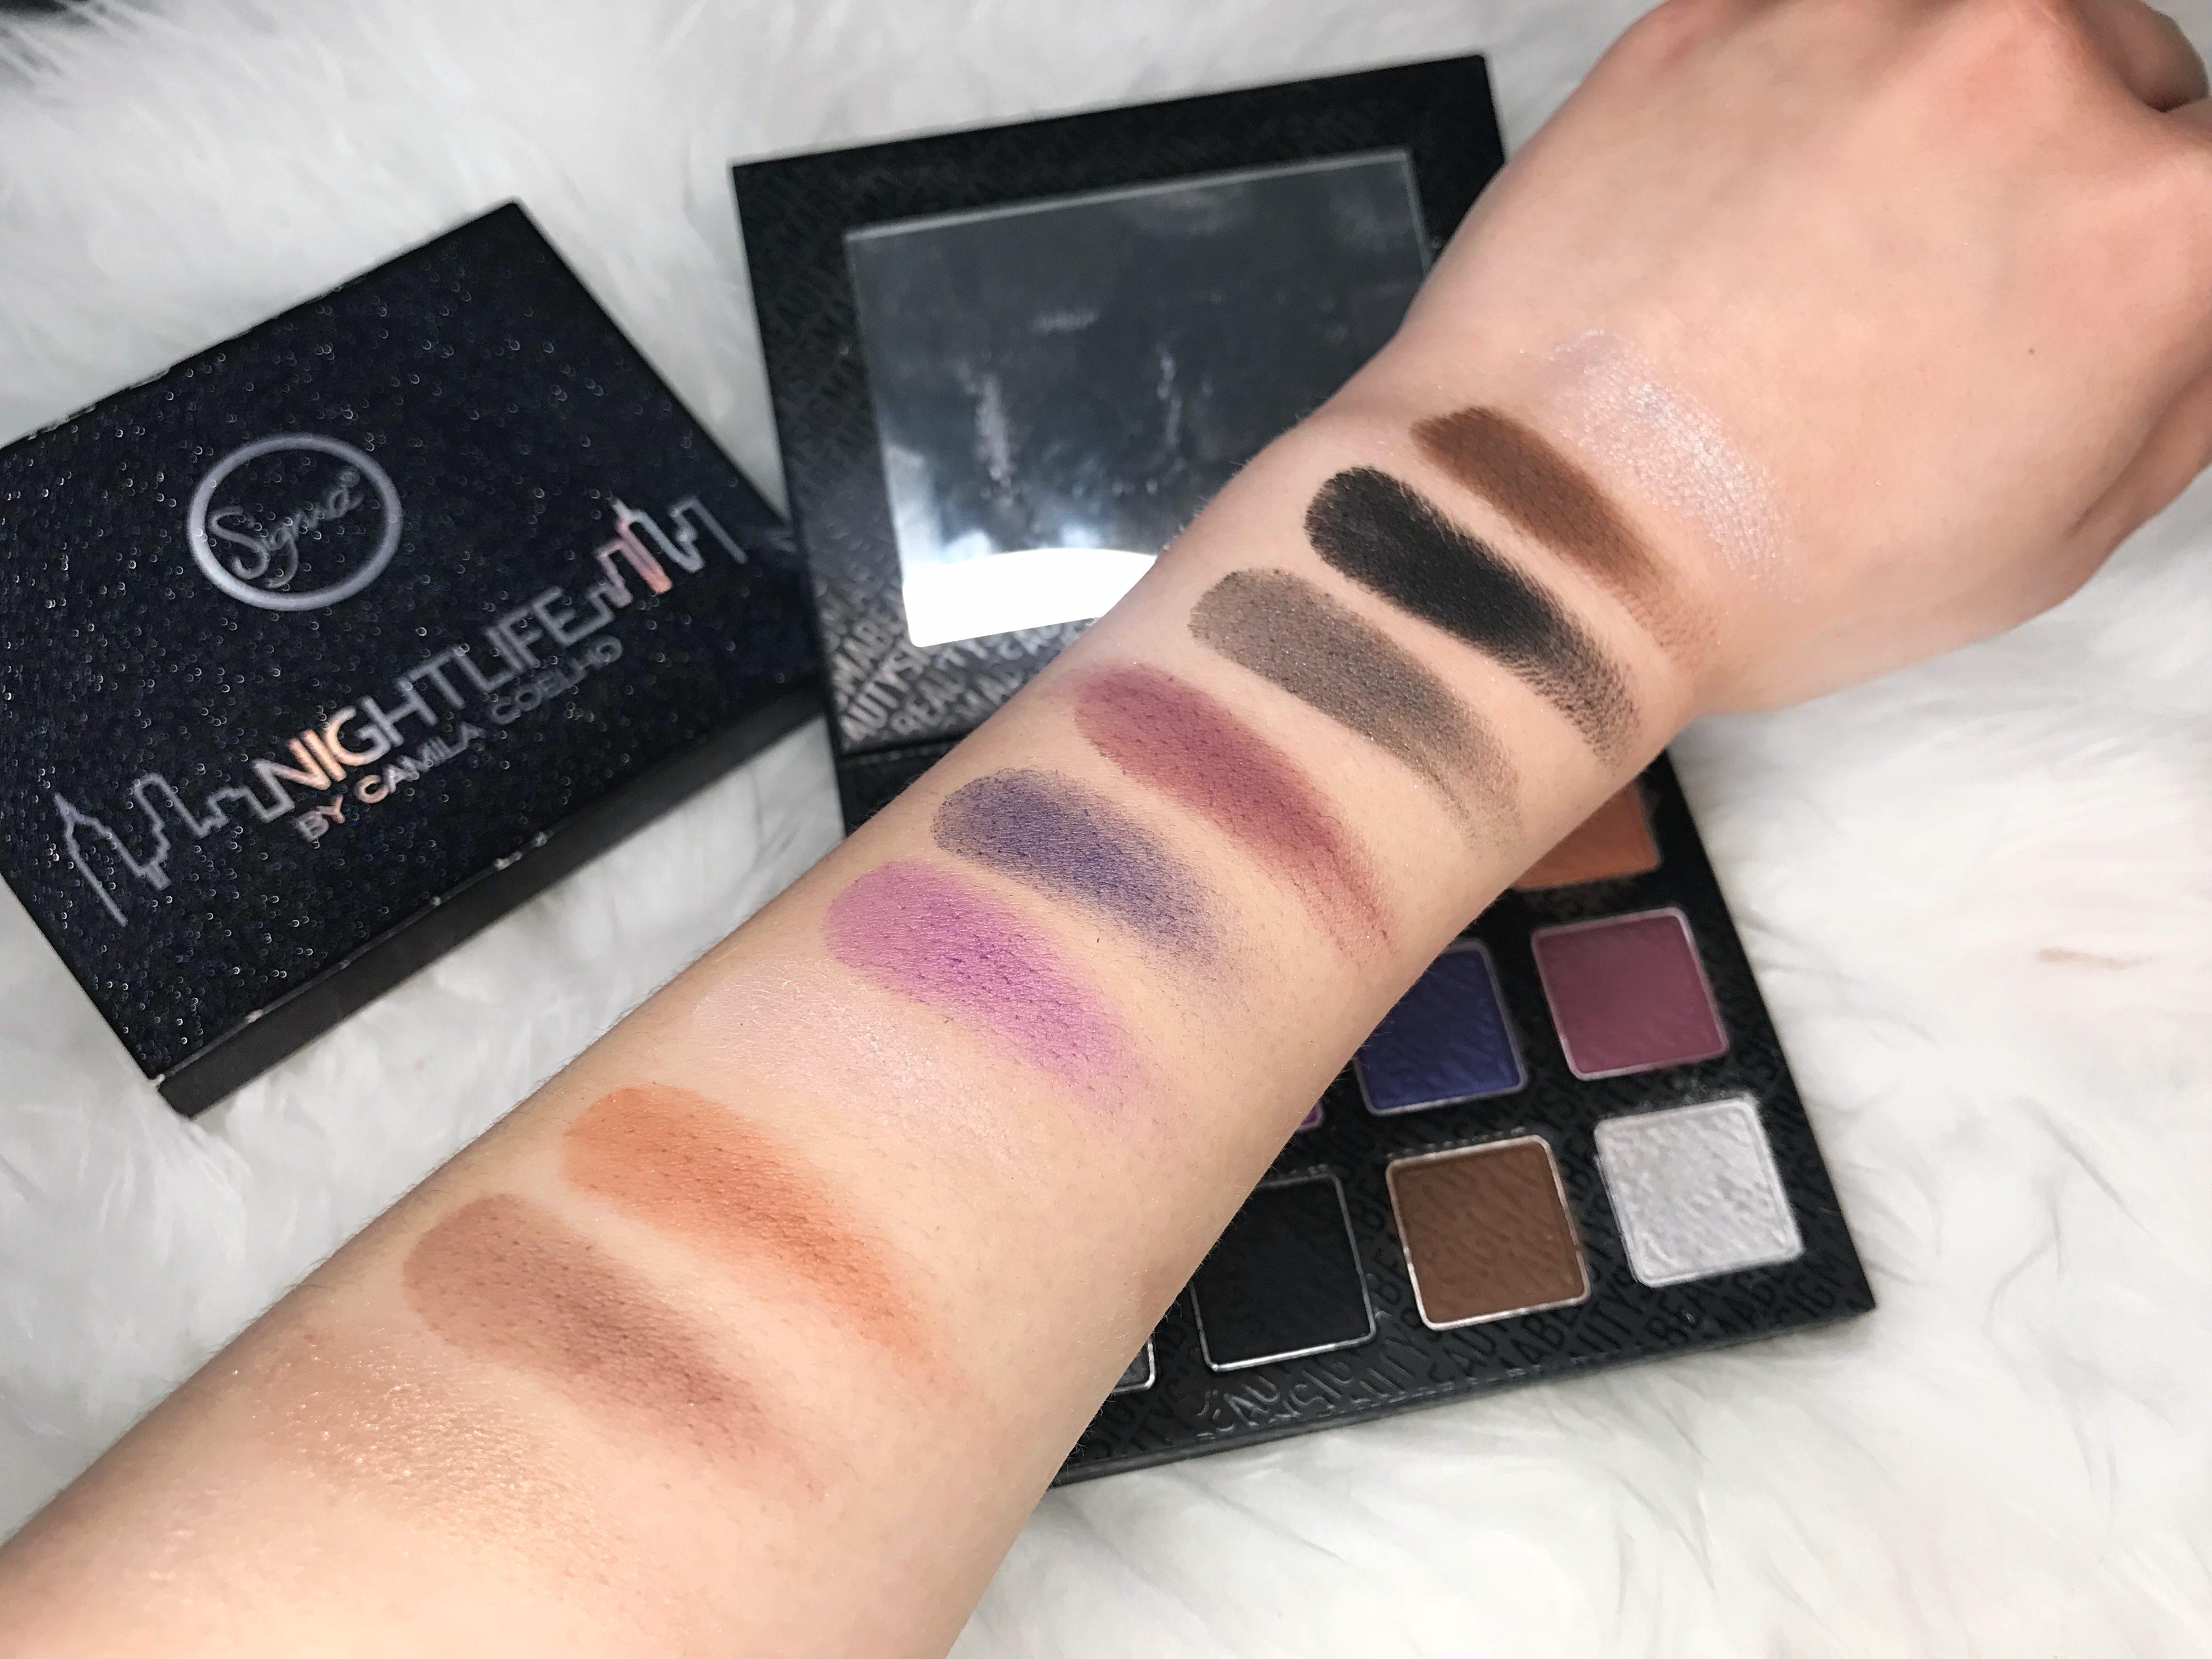 Sigma beauty nightlife palette camila coelho